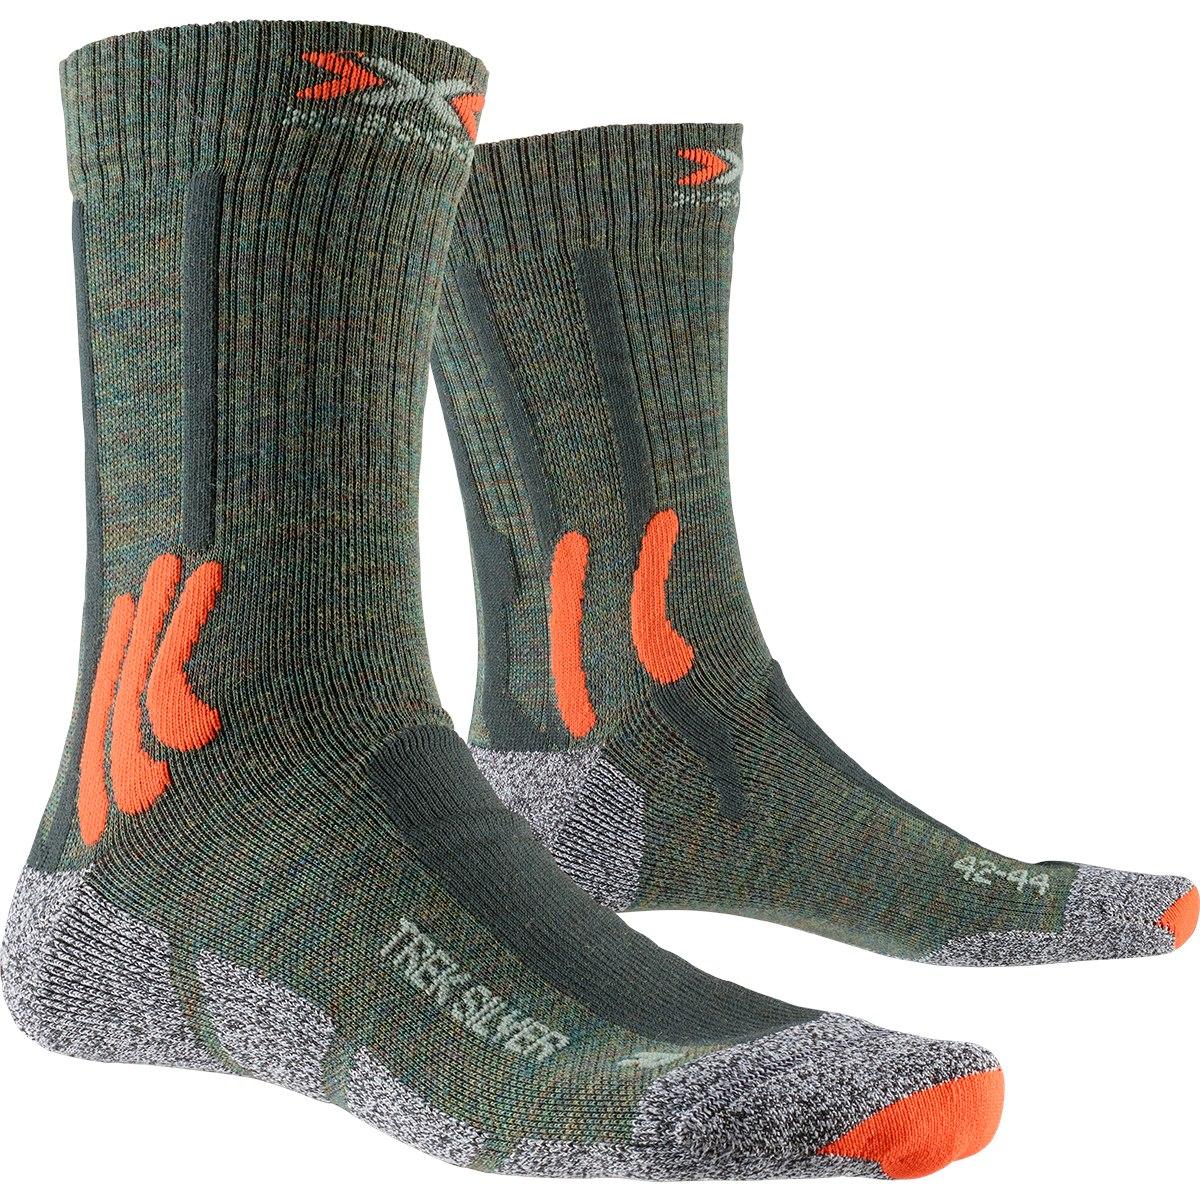 X-Socks Trek Silver Socken - olive melange/x-orange/grey melange